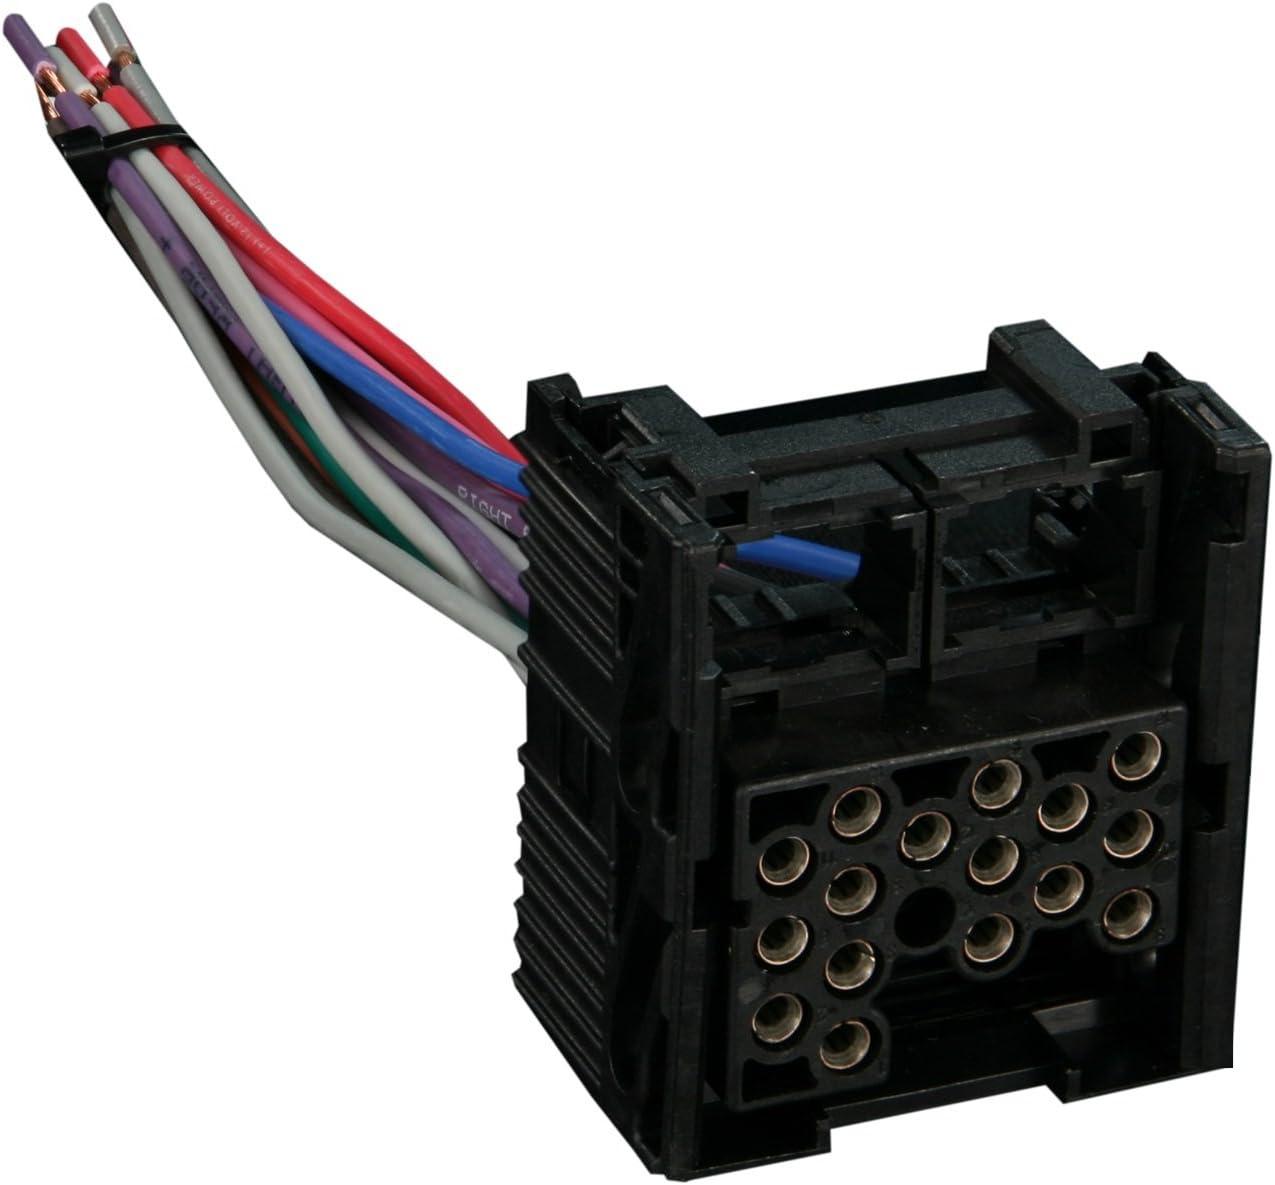 amazon.com: metra 71-8590 reverse wiring harness for select 1990-2002 bmw  vehicles oem radio: car electronics  amazon.com